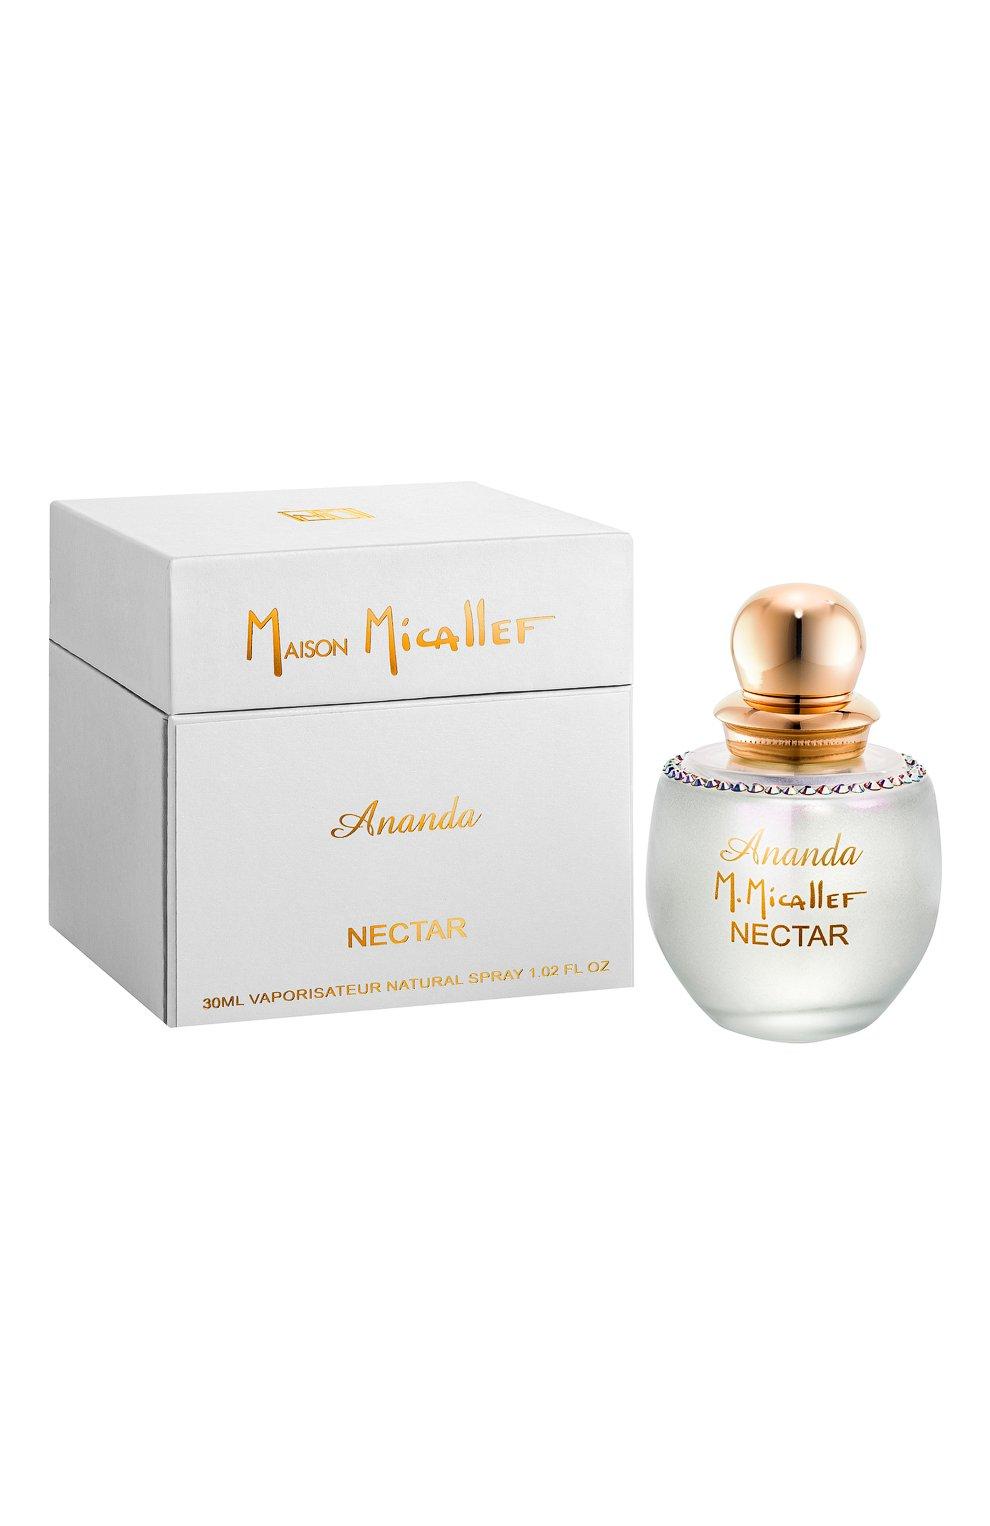 Духи ananda nectar (30ml) M. MICALLEF бесцветного цвета, арт. 3760231058191 | Фото 1 (Ограничения доставки: flammable)